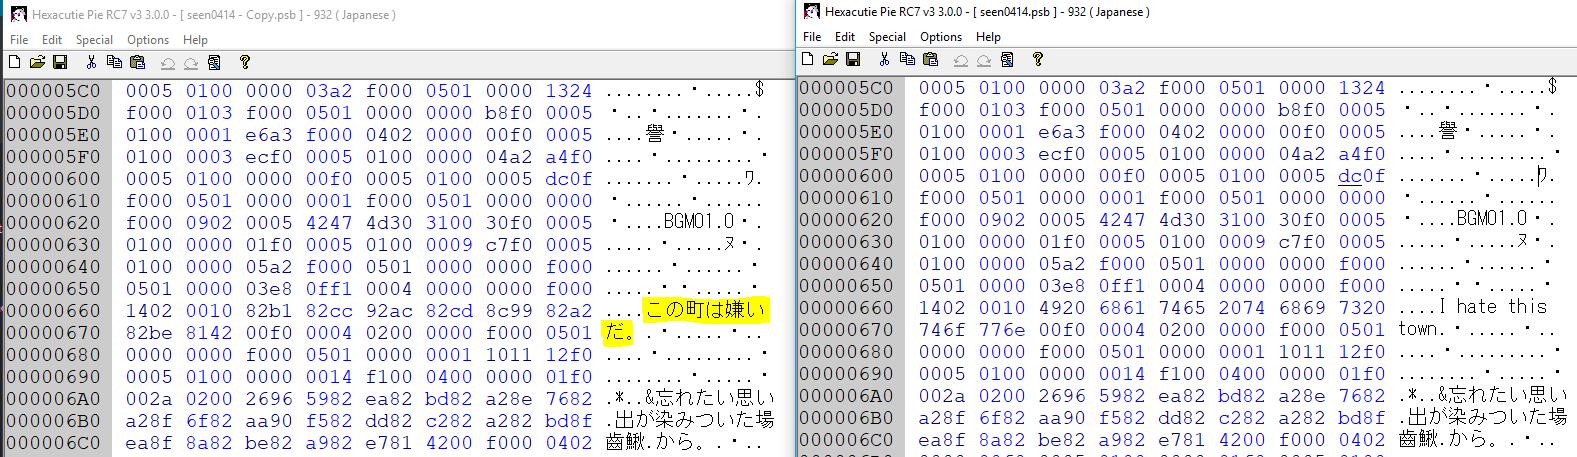 PS3 Text Hacking Example - Kiwidget